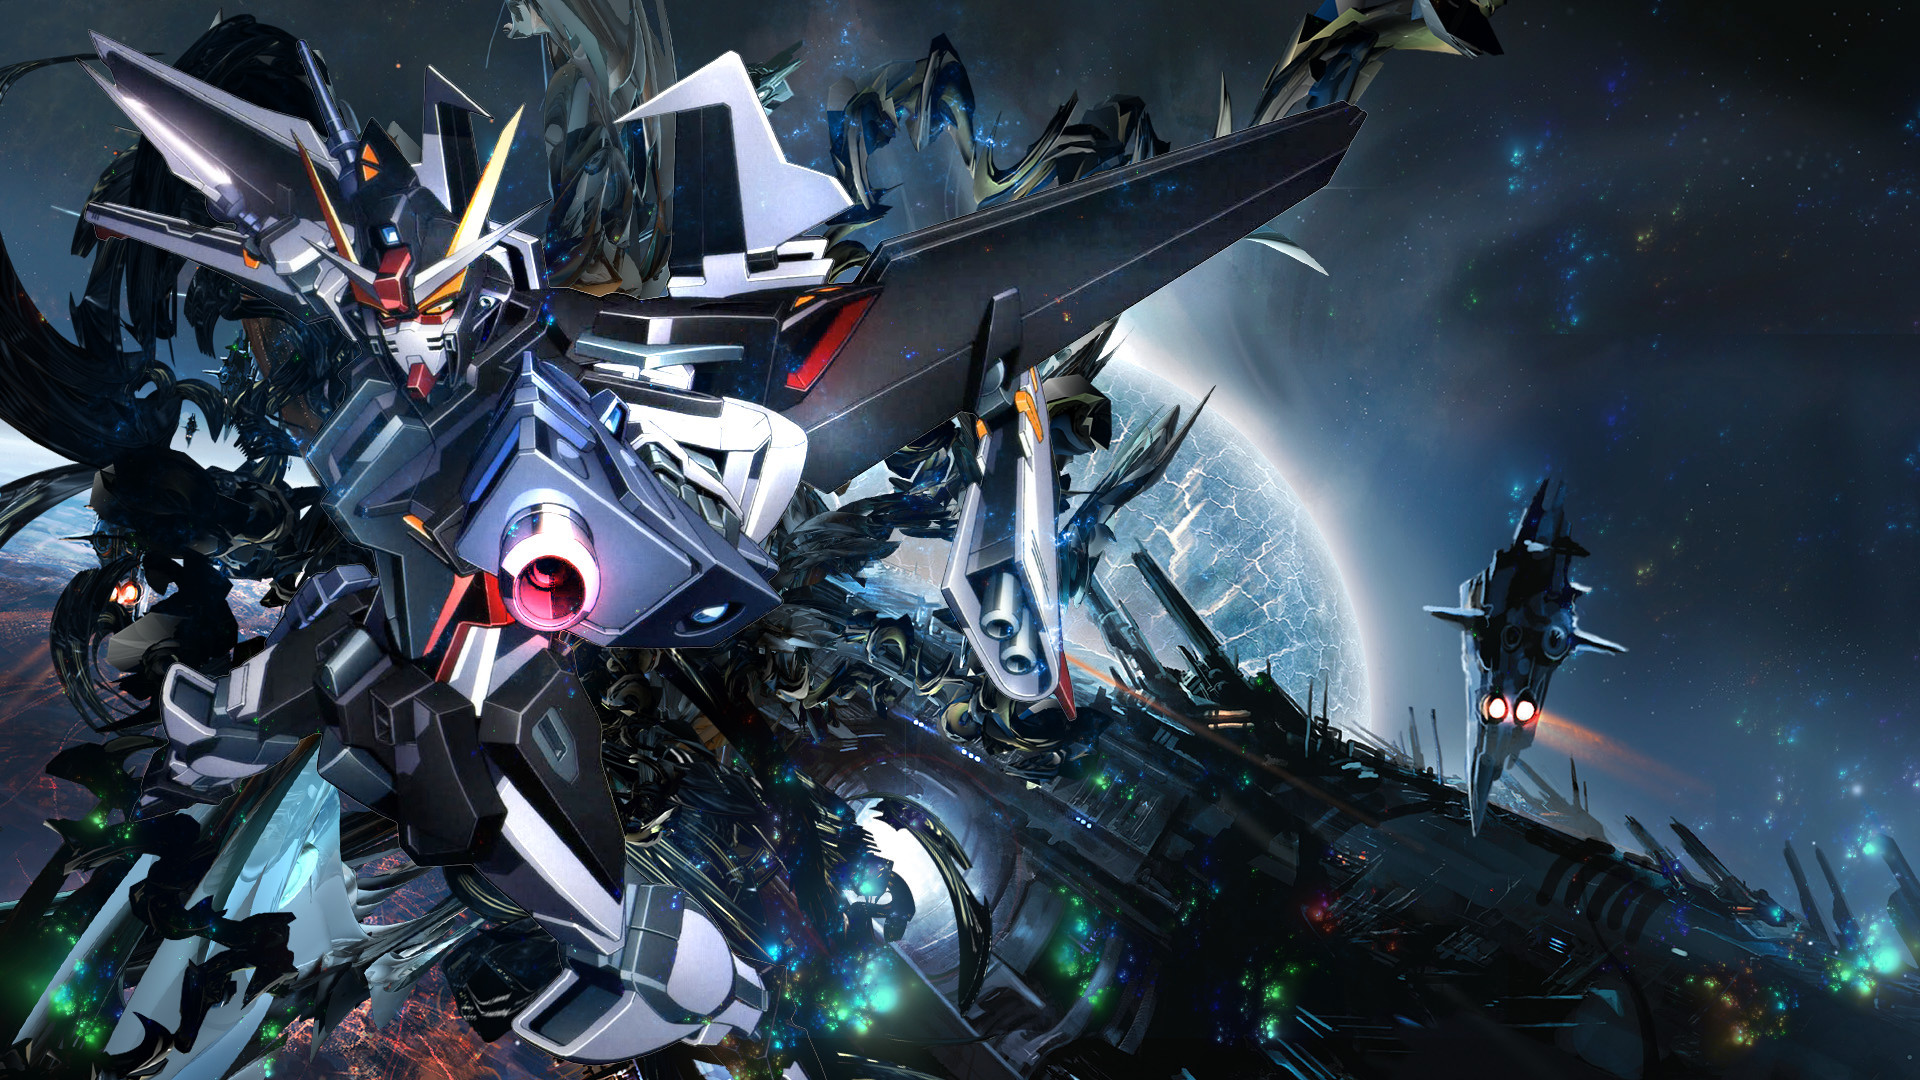 Gundam 00 Wallpaper Hd 67 Images